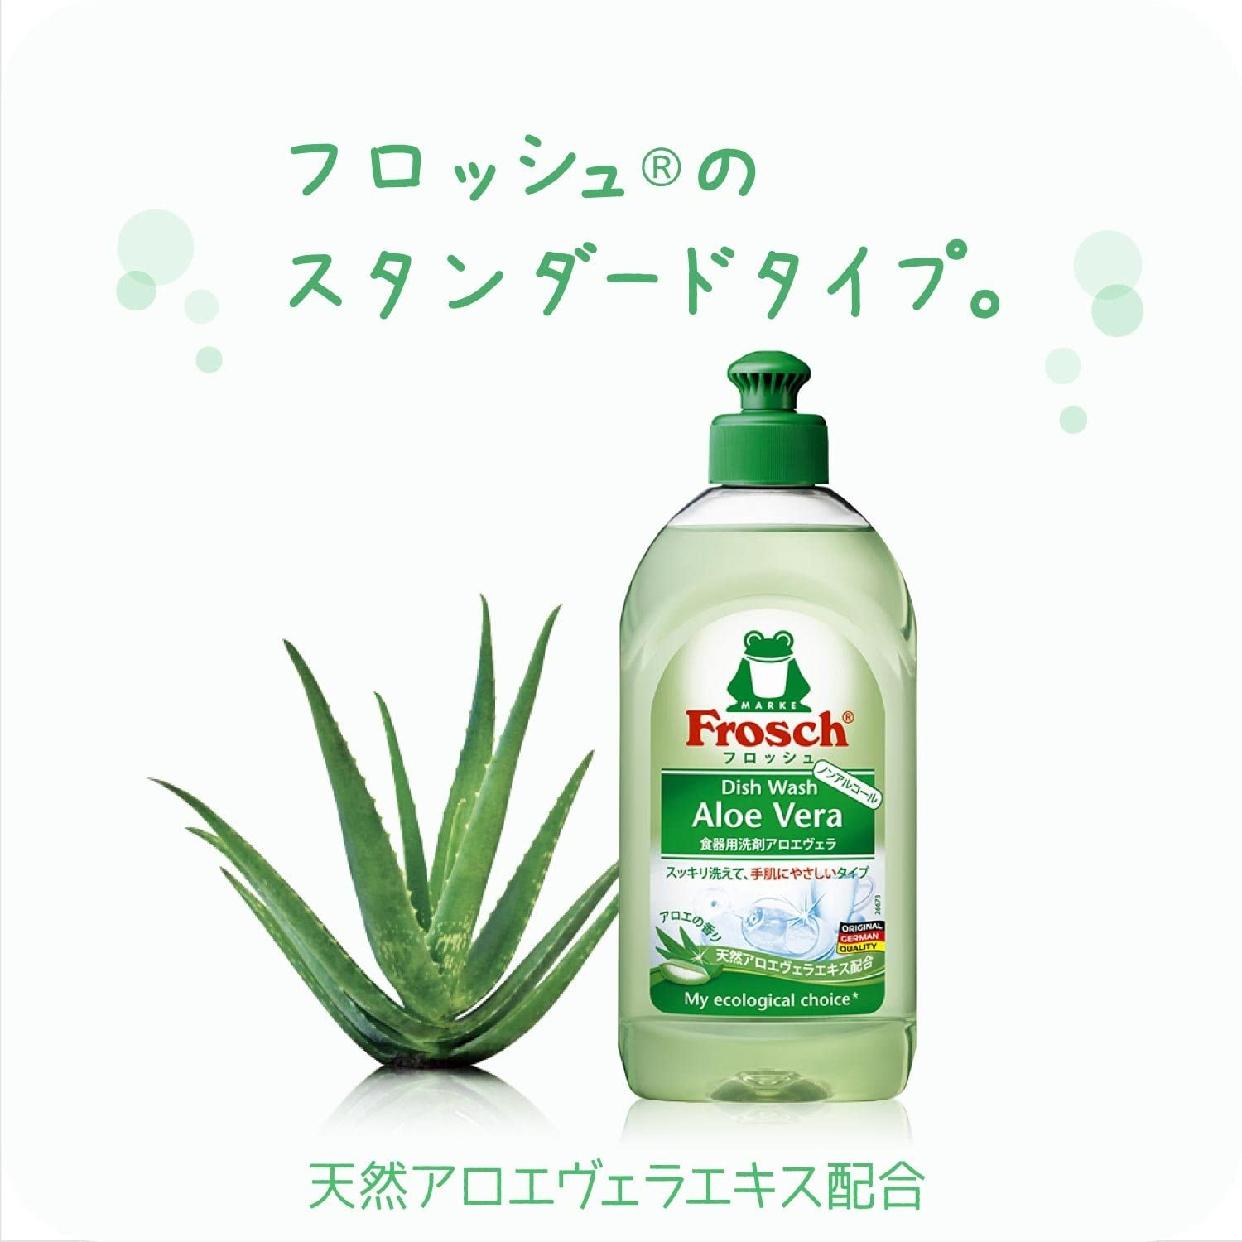 Frosch(フロッシュ) 食器用洗剤 アロエヴェラの商品画像4